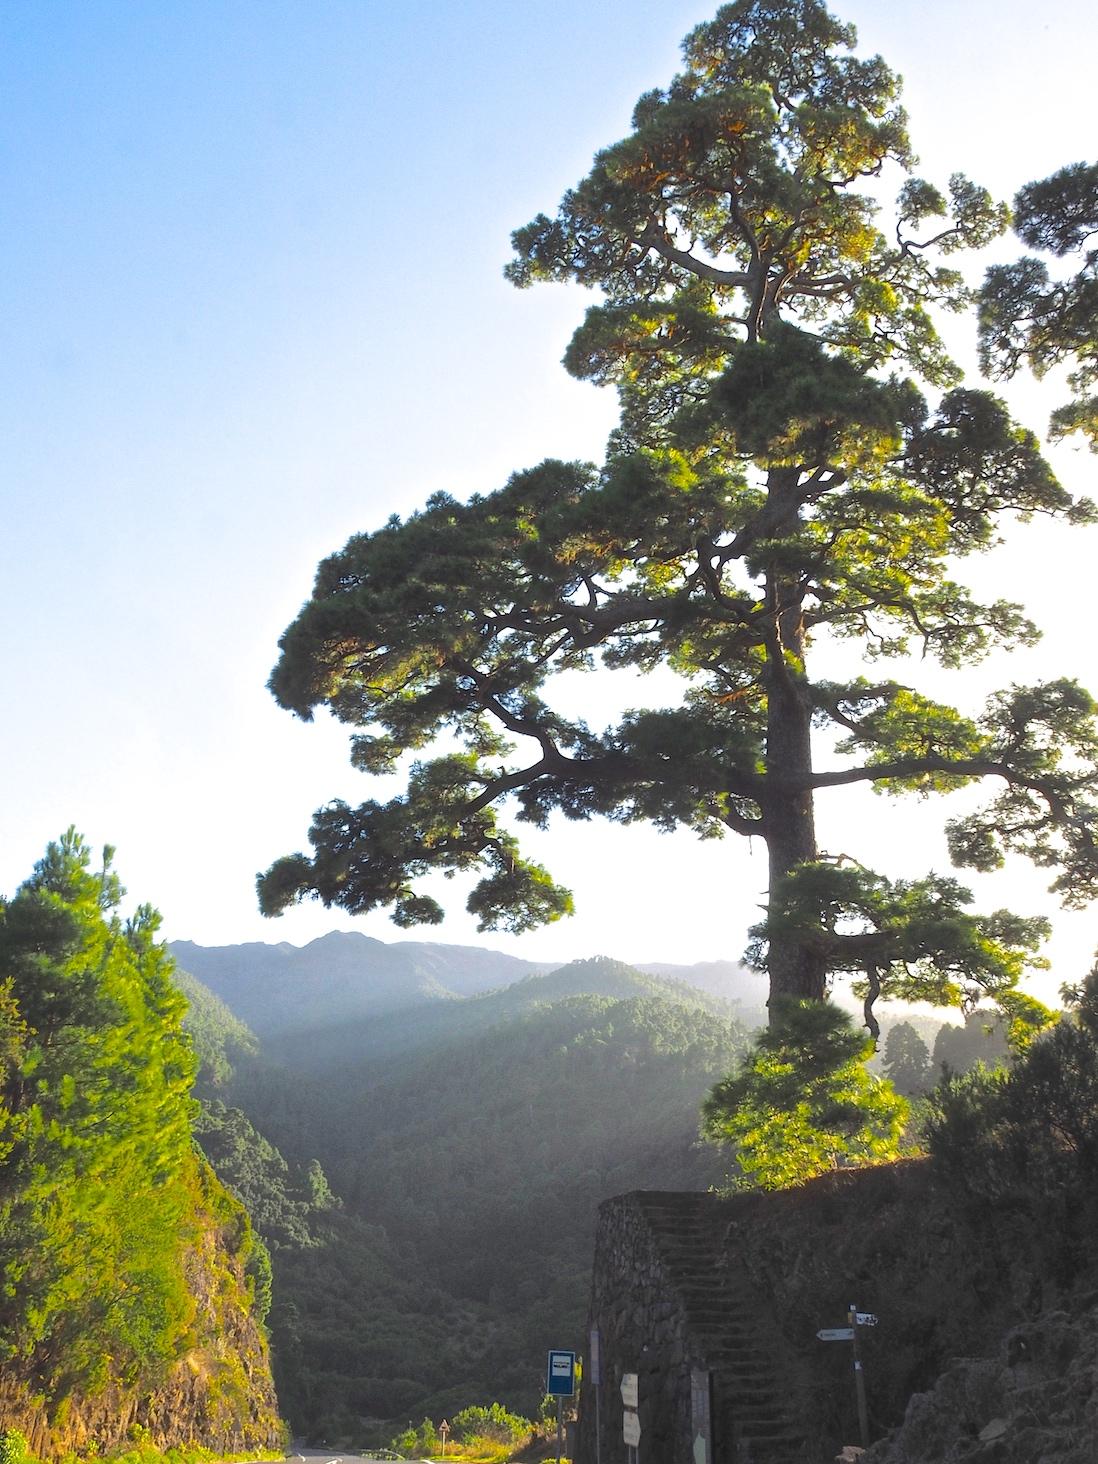 Kanaren Urwald Vulkane La Gomera La Palma Nationalparks